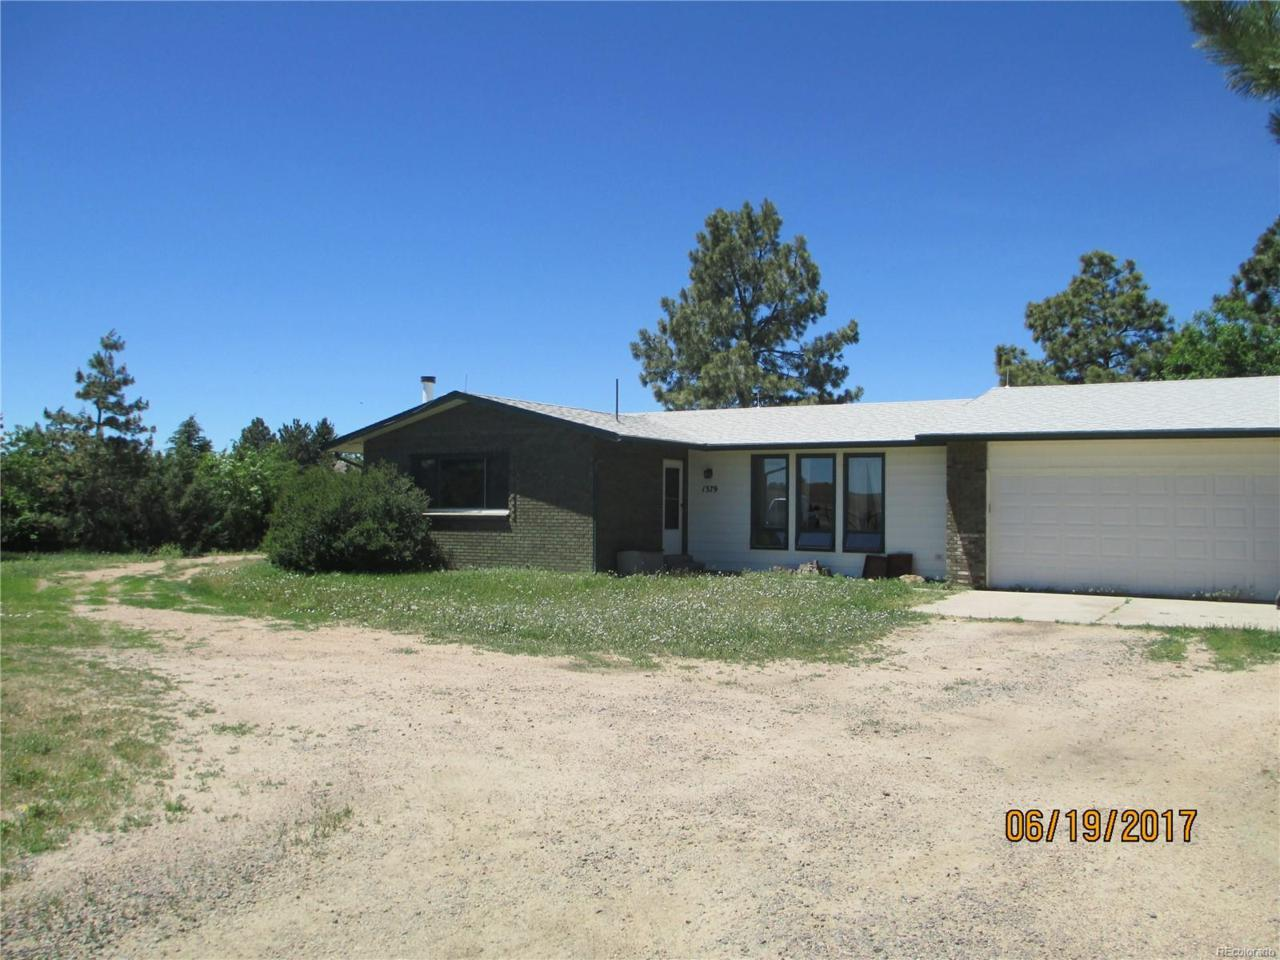 1379 S Indianfield Street, Bennett, CO 80102 (MLS #3303175) :: 8z Real Estate